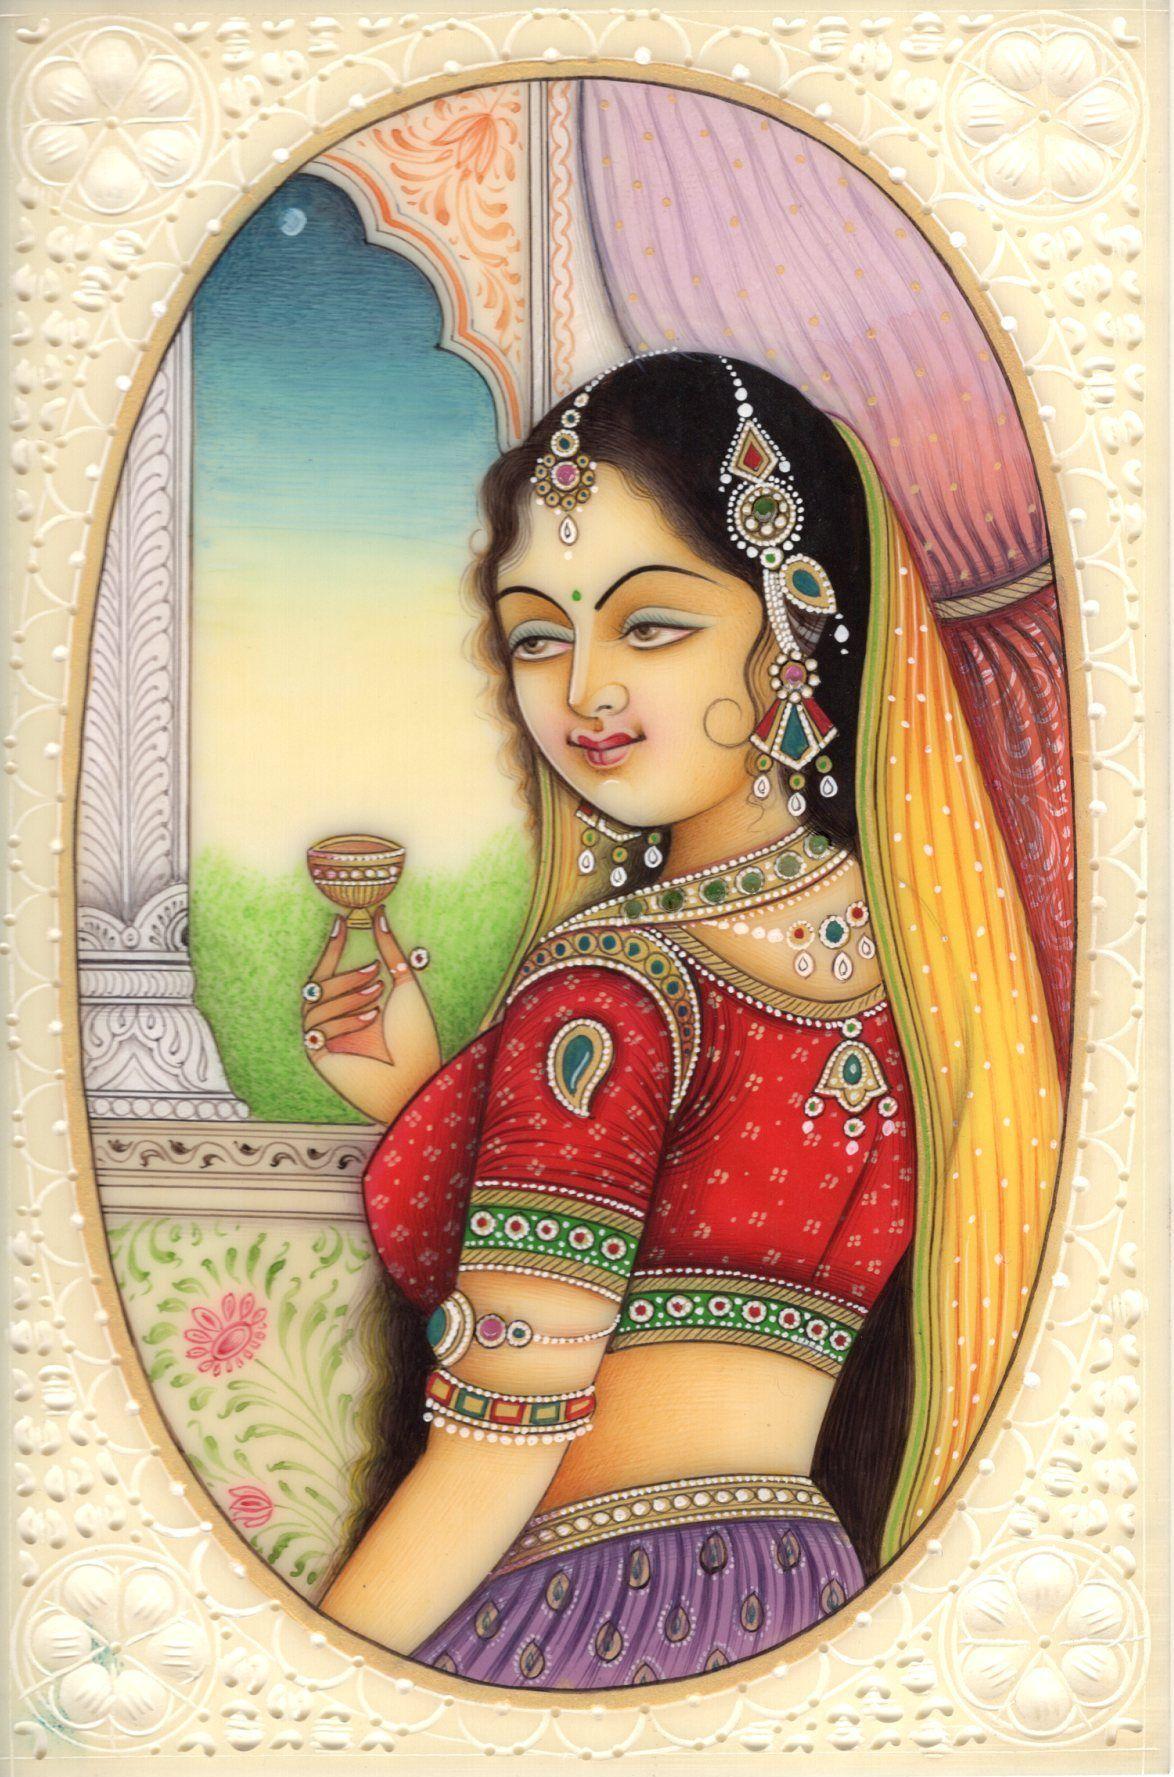 Indian Miniature Painting Lady Princess Handmade